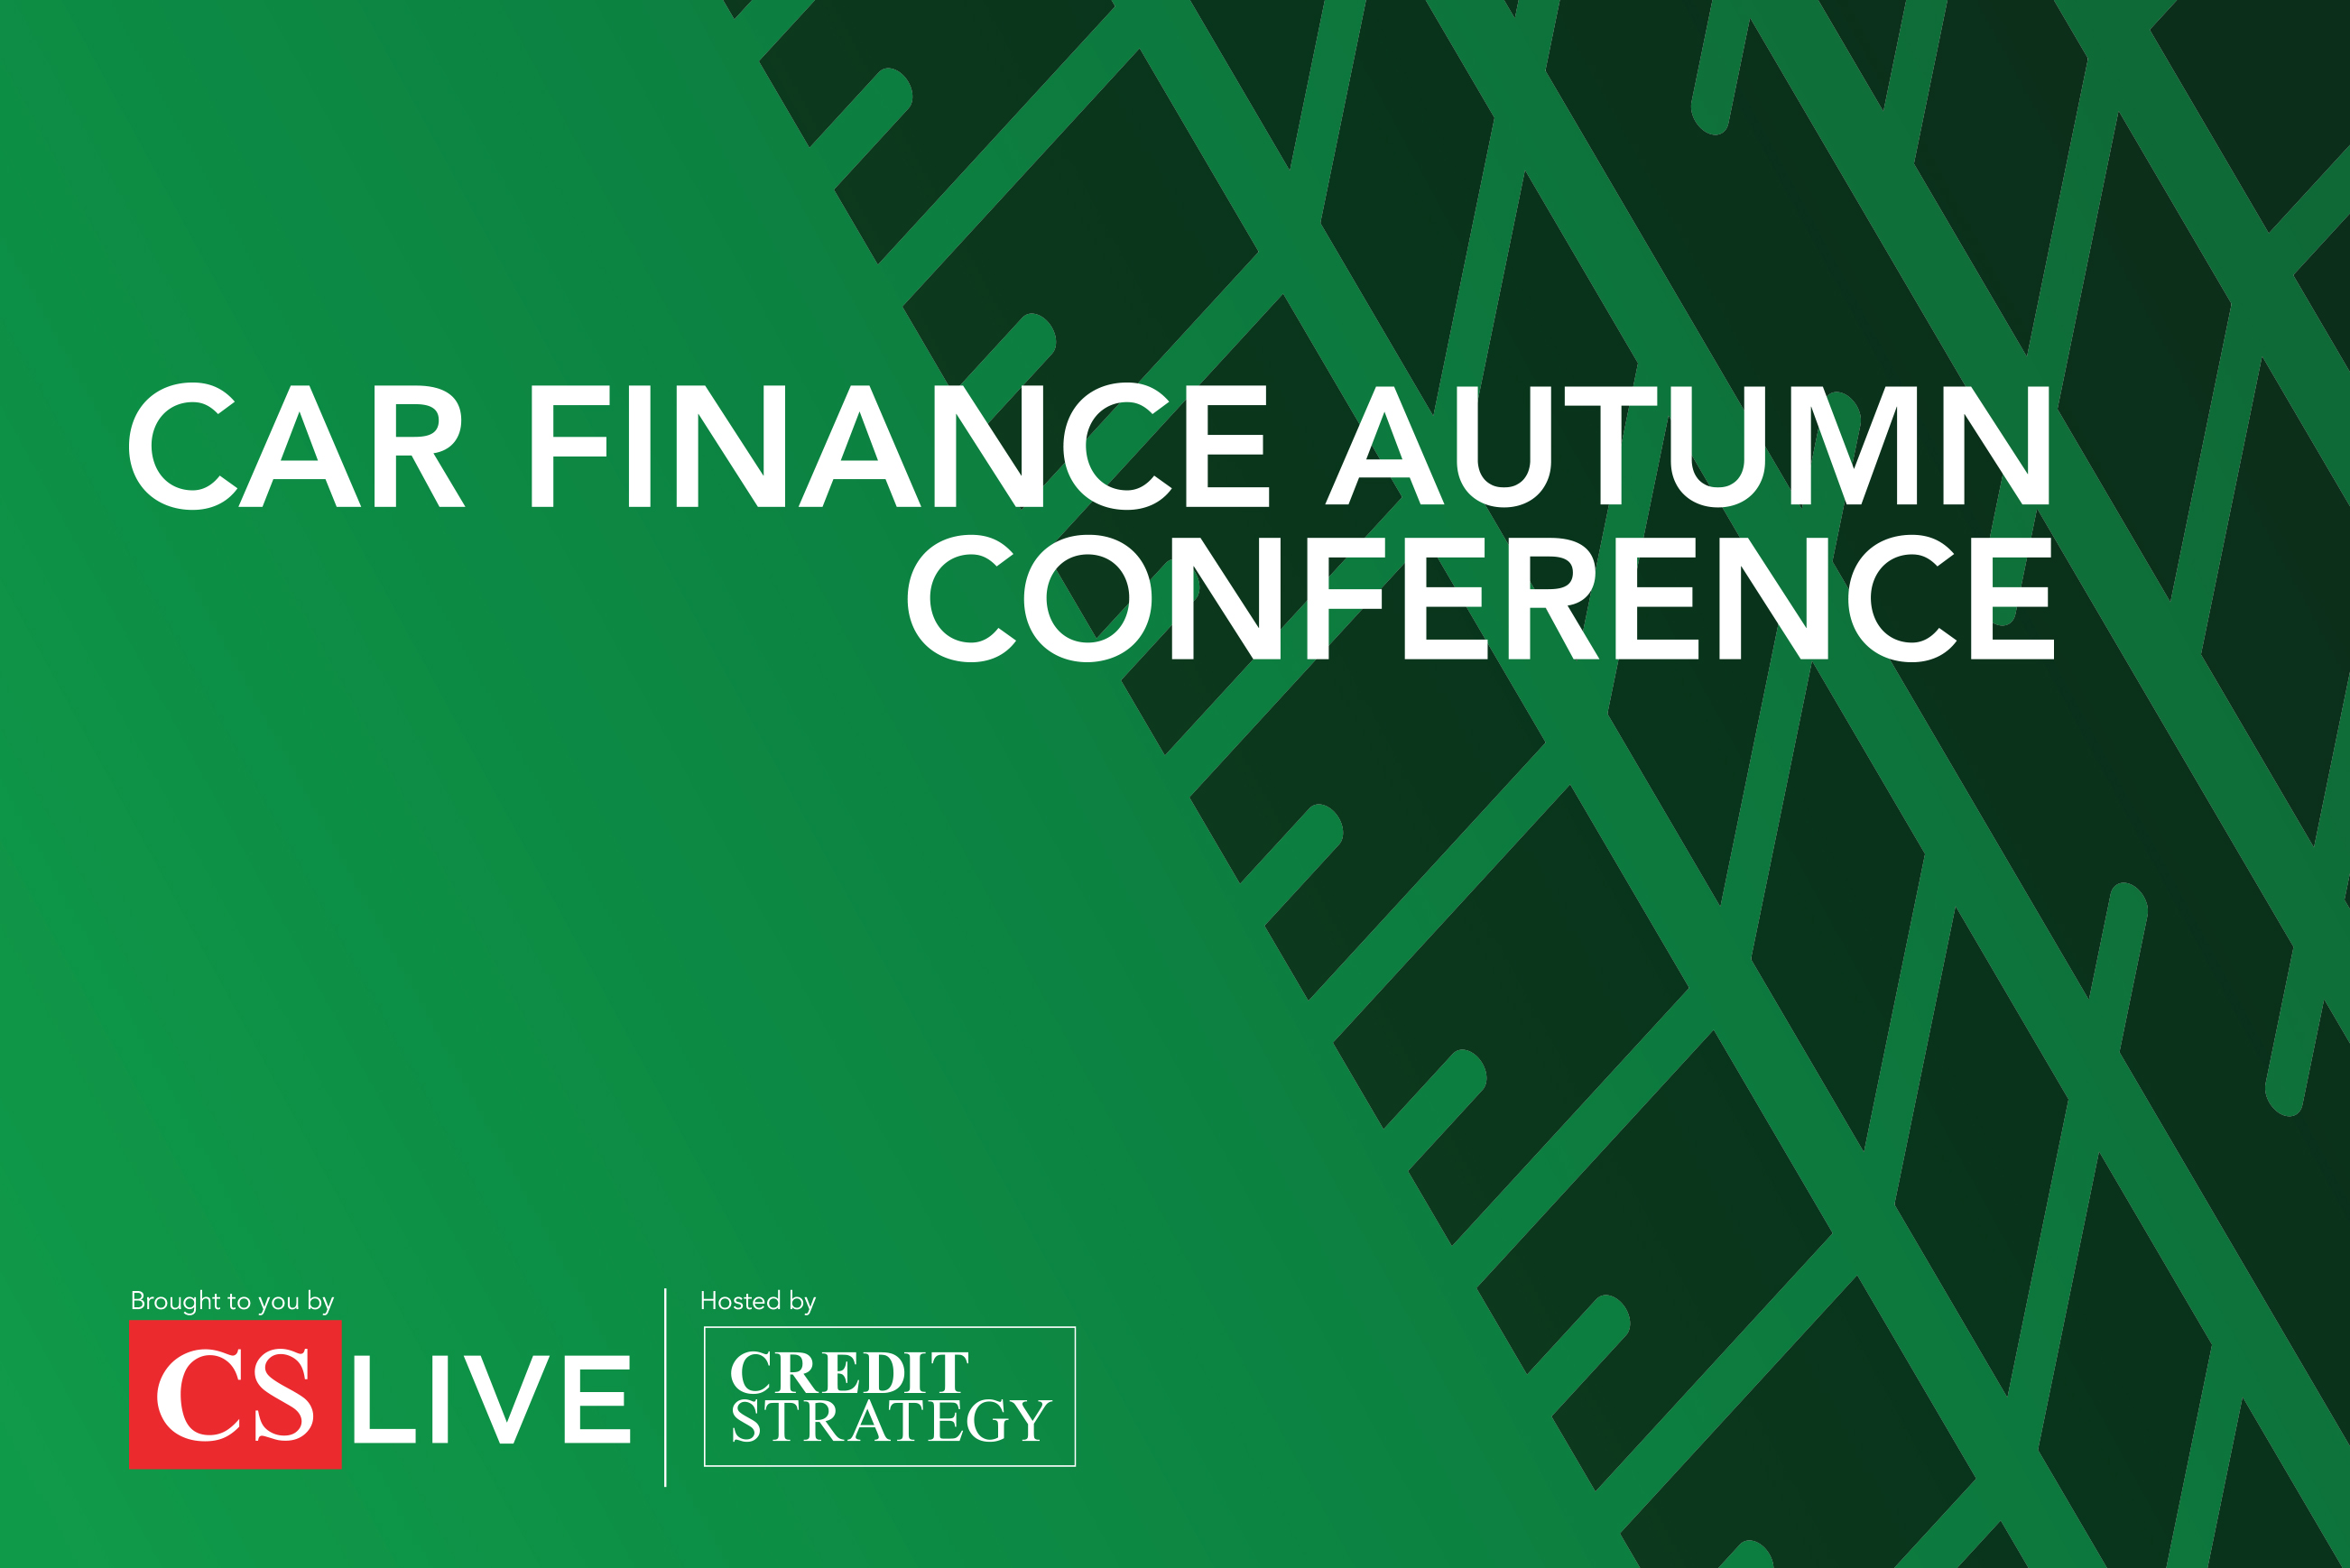 Car Finance Autumn Conference